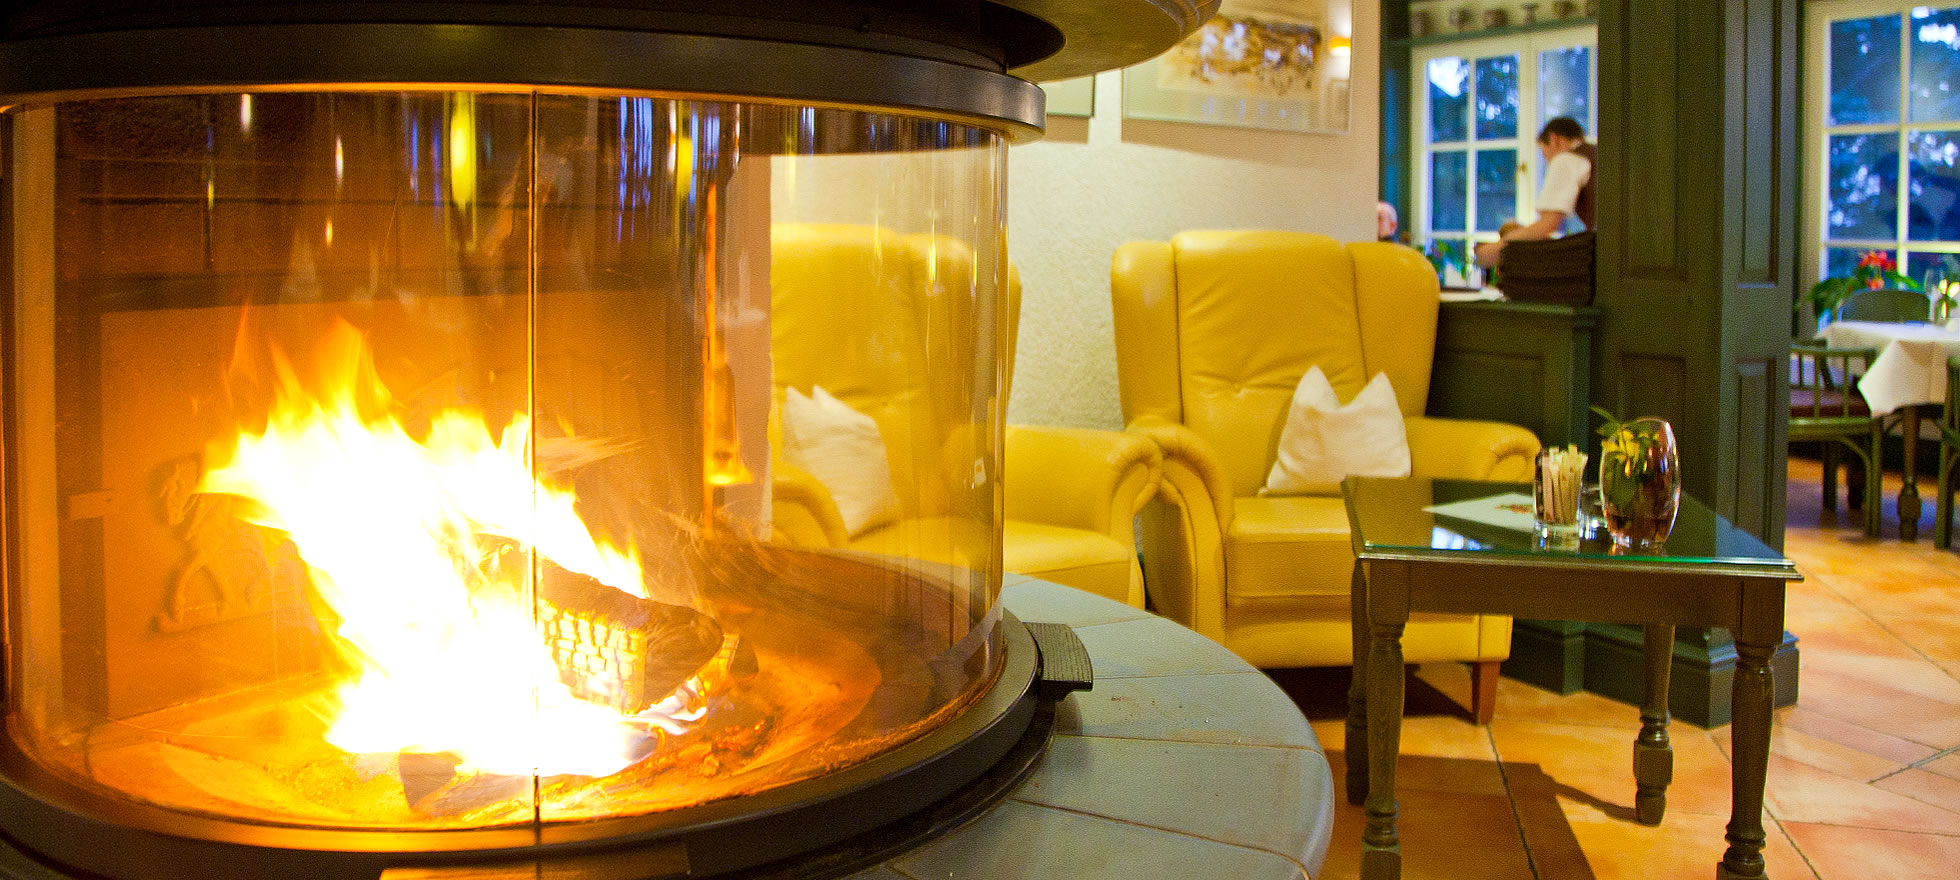 Kamin im Restaurant Café Namenlos